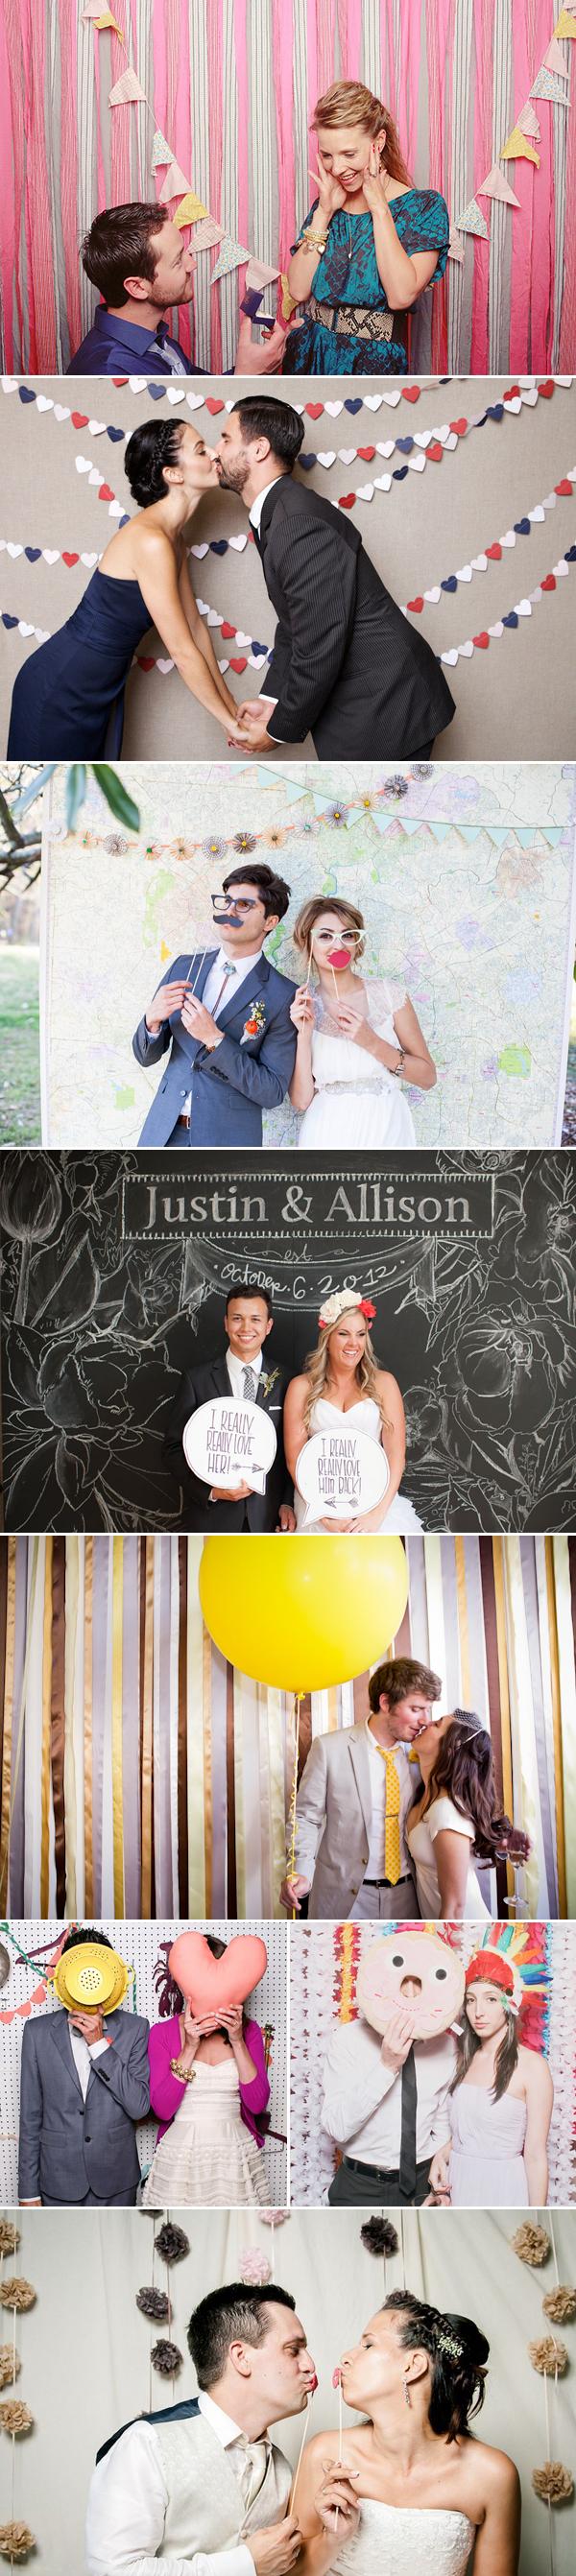 photobooth01-couple1